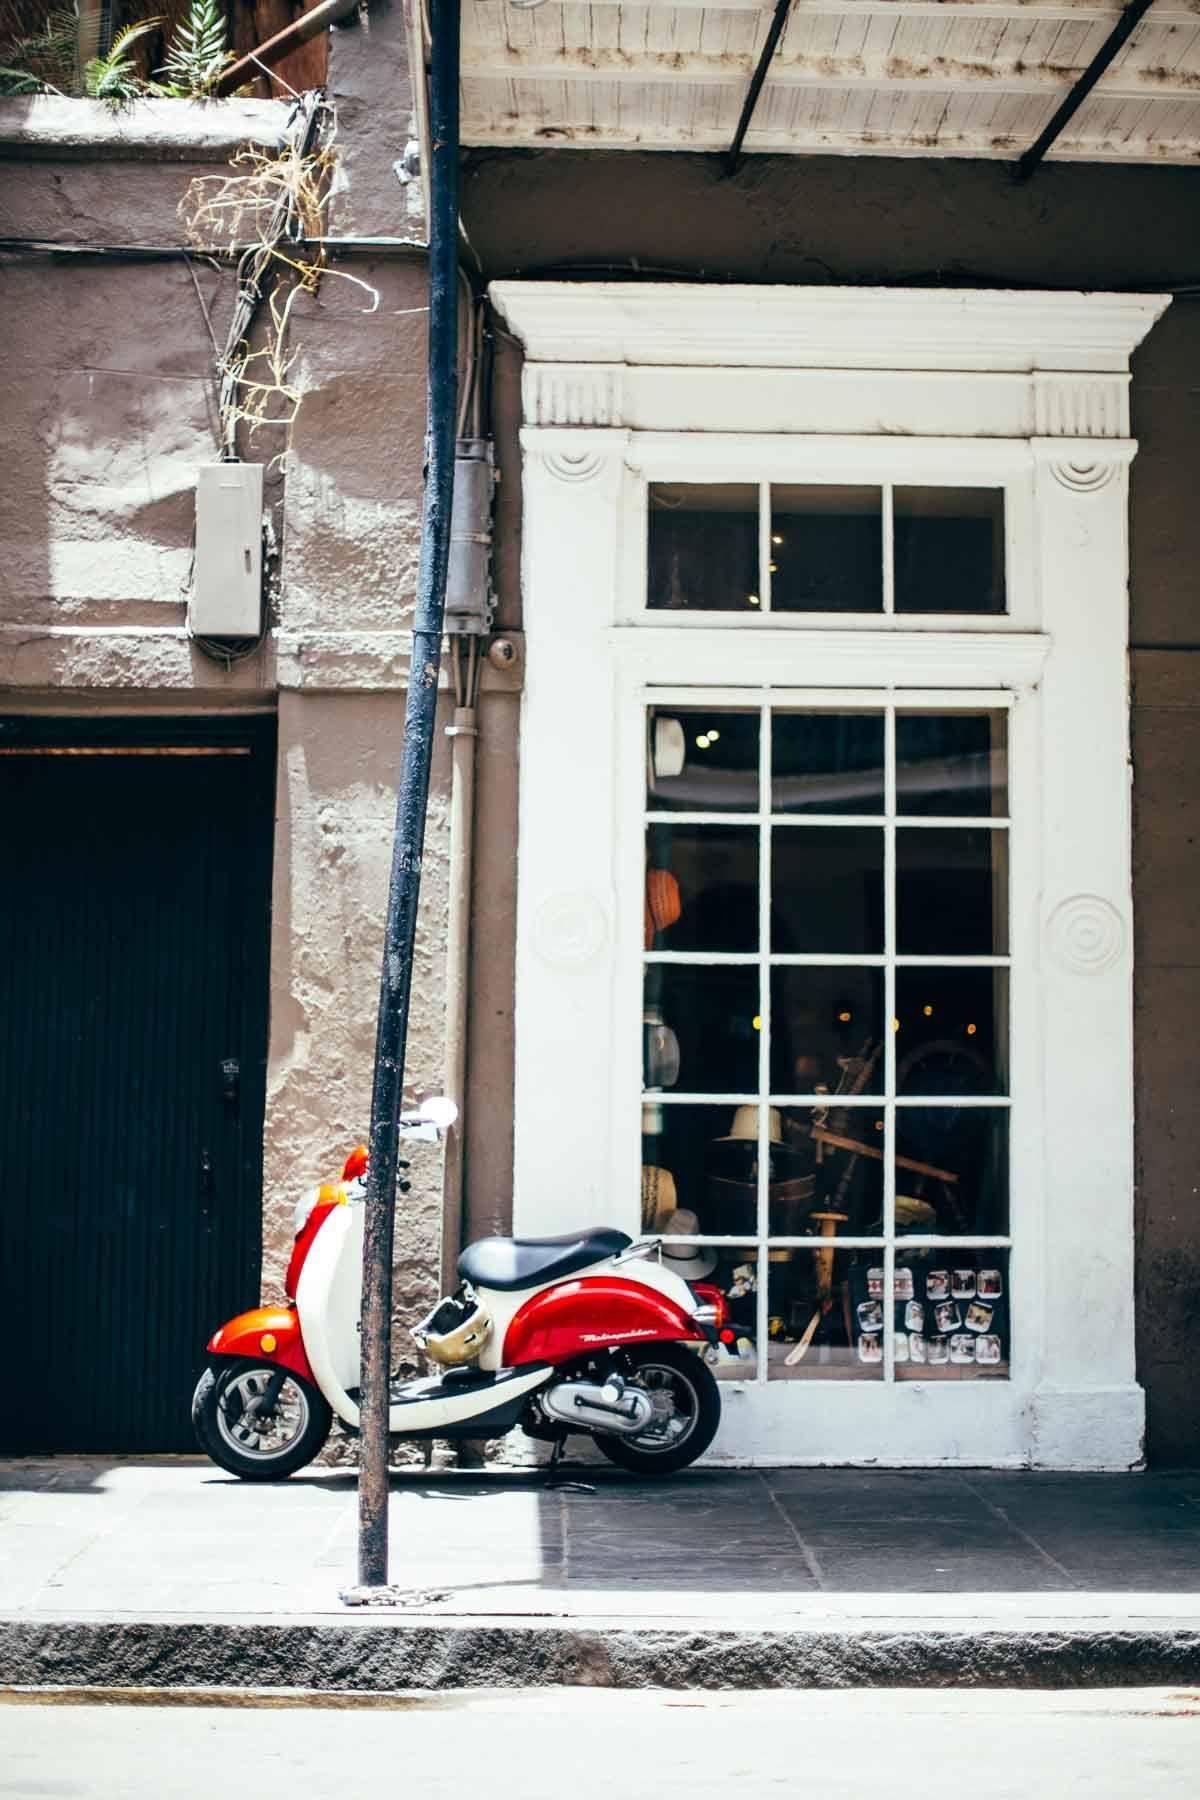 Motor bike on the sidewalk.